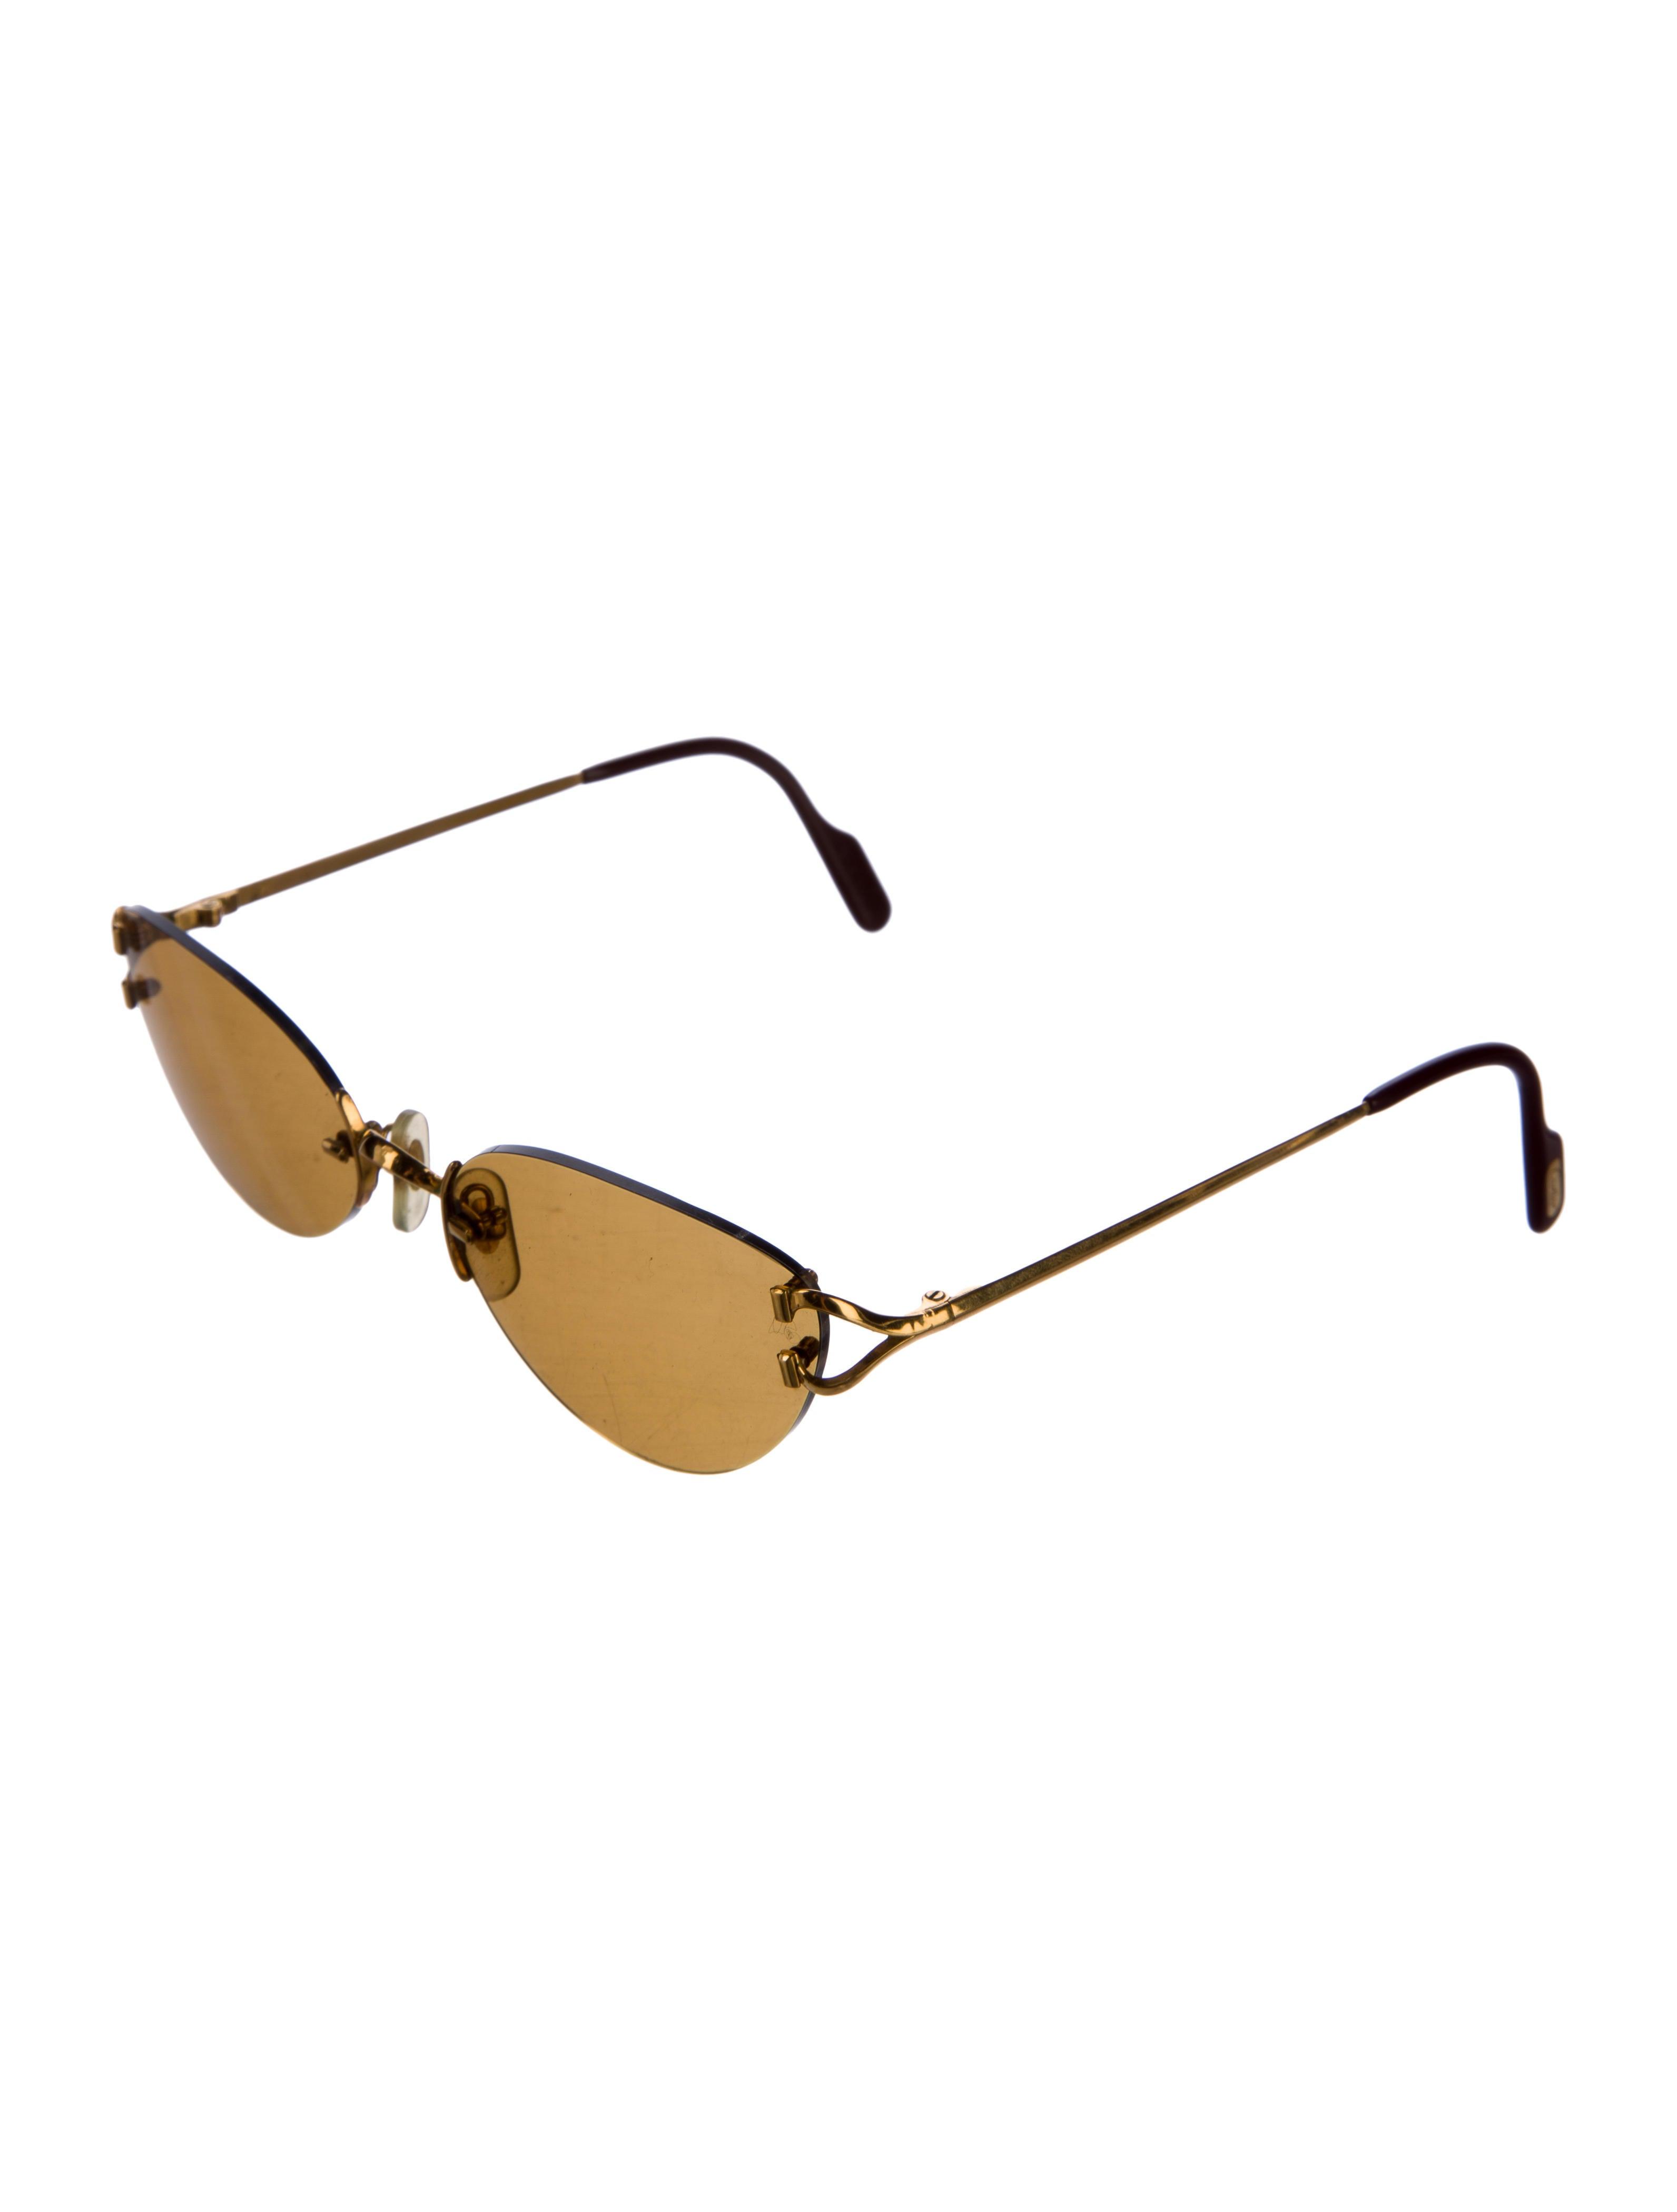 b70f2221d4 Cartier Rimless Narrow Sunglasses - Accessories - CRT31129